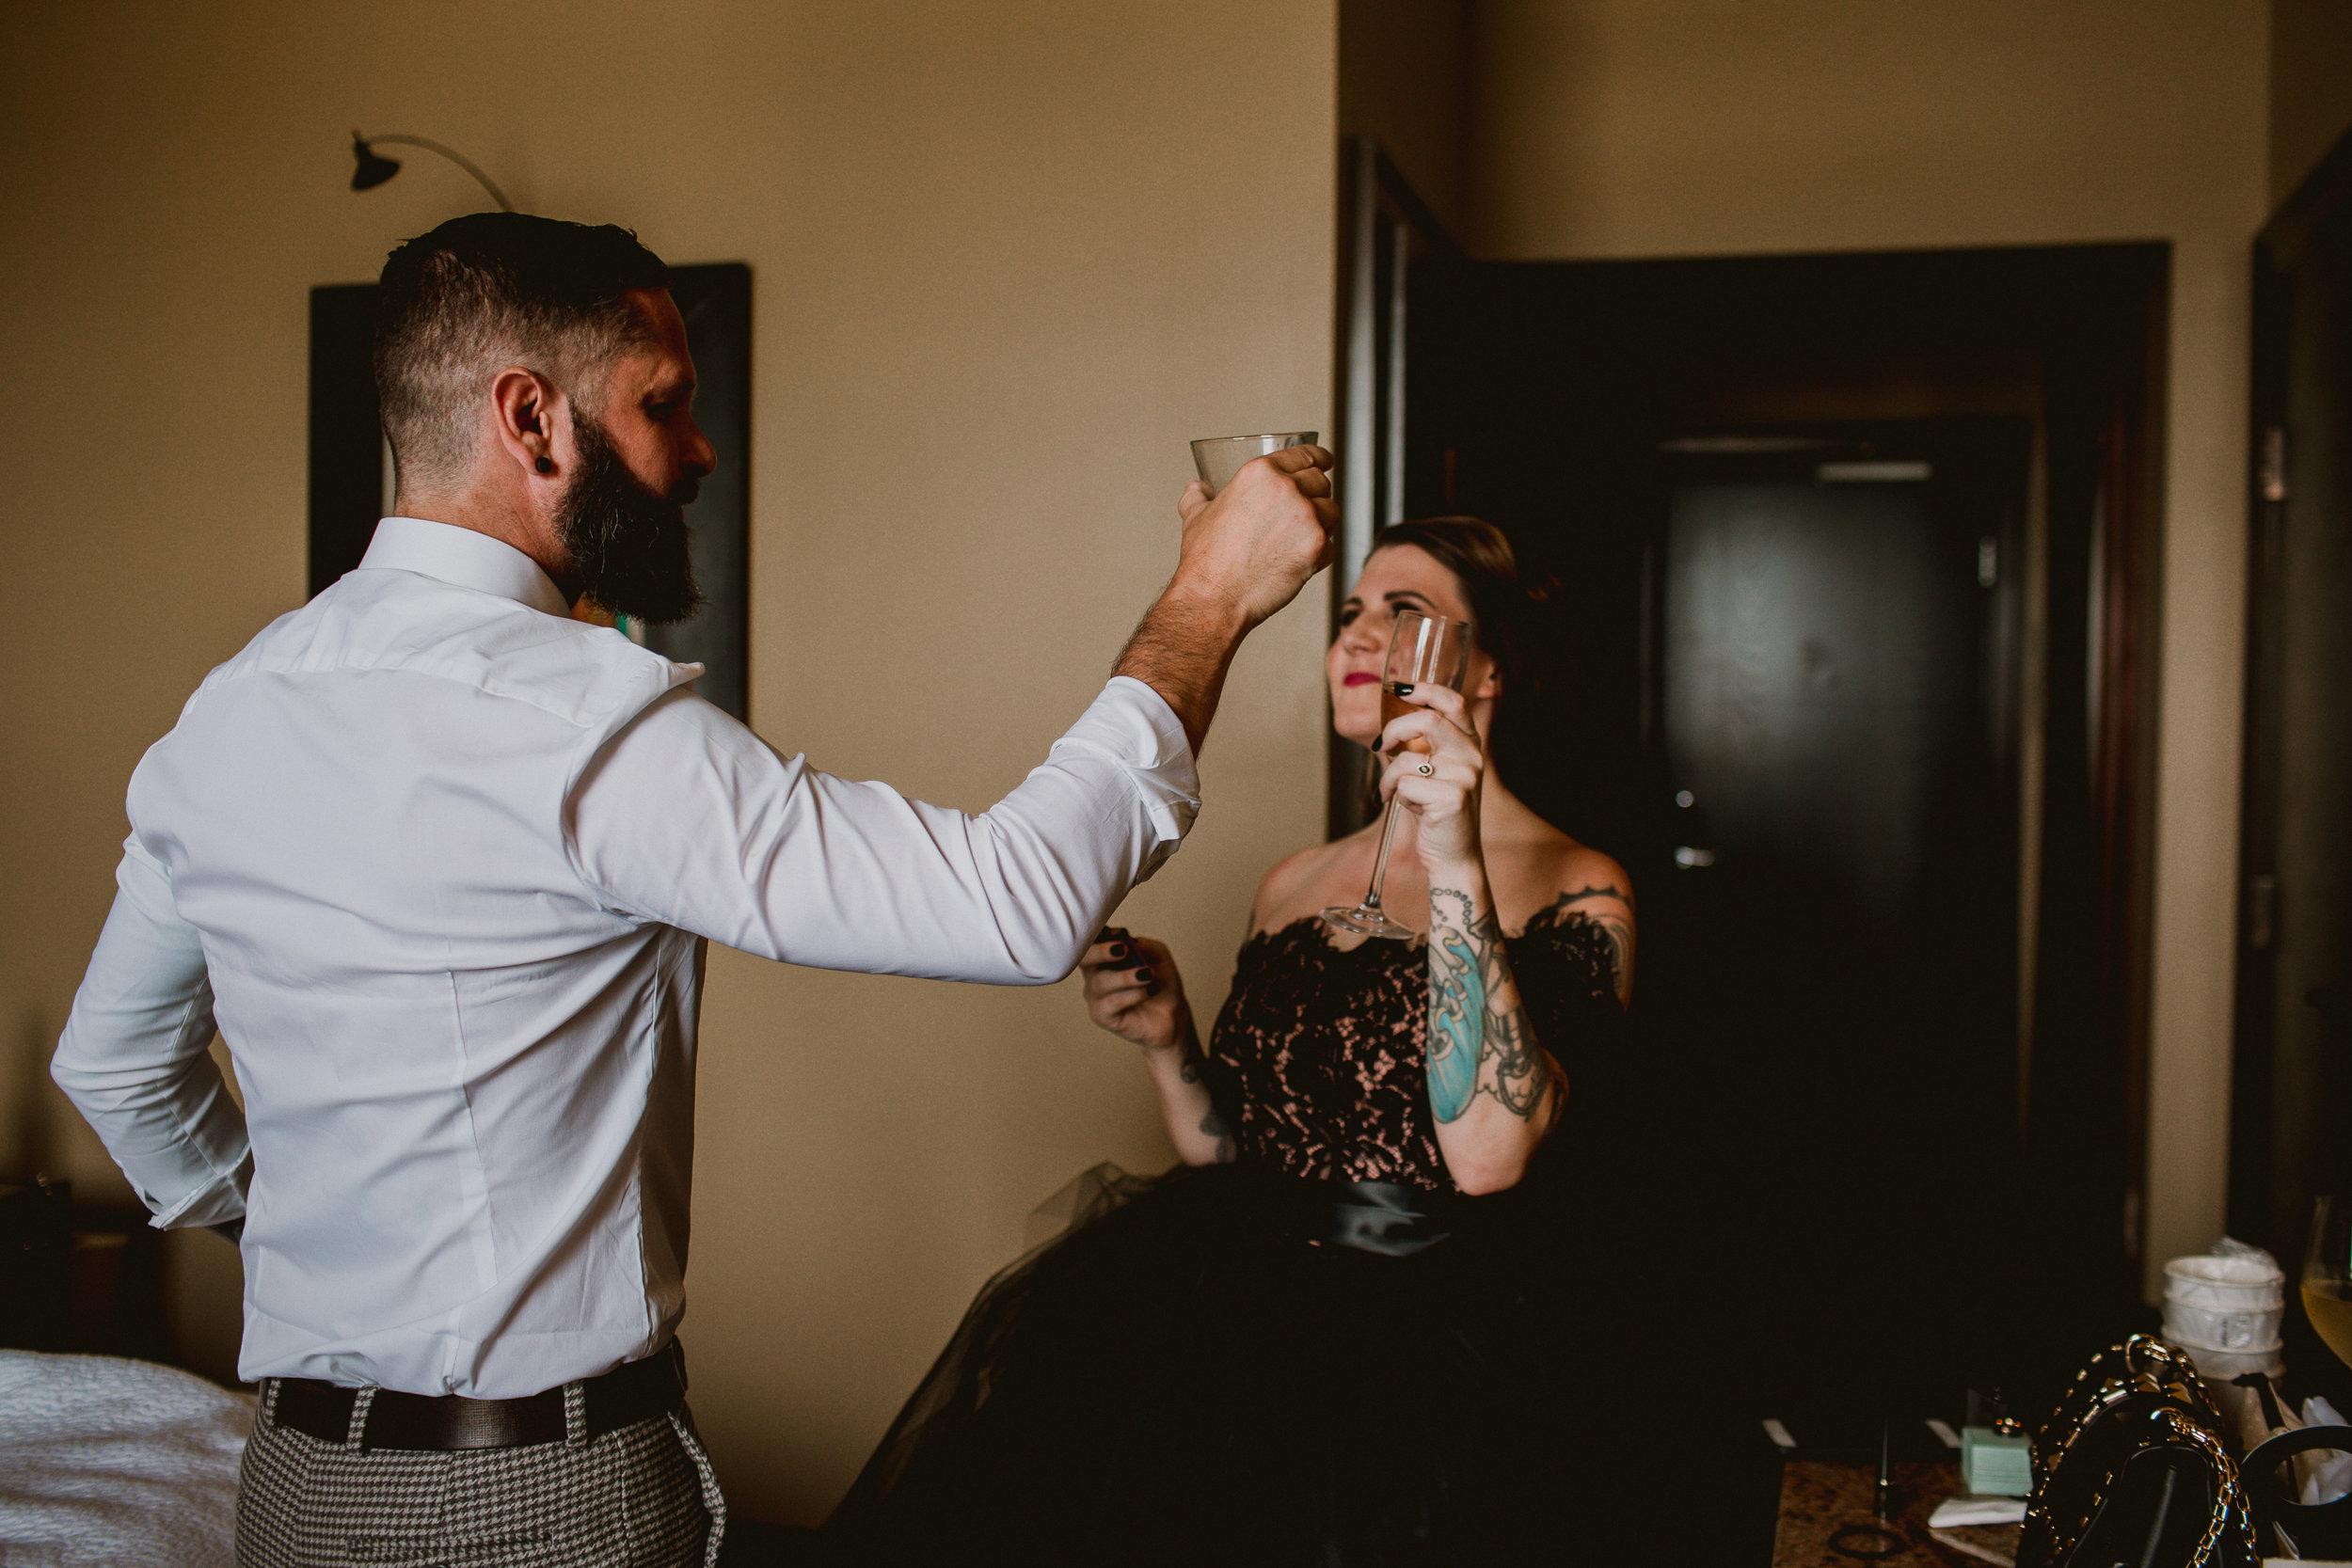 bohemian-hotel-savannah-elopement-kelley-raye-atlanta-wedding-photographer-29.jpg